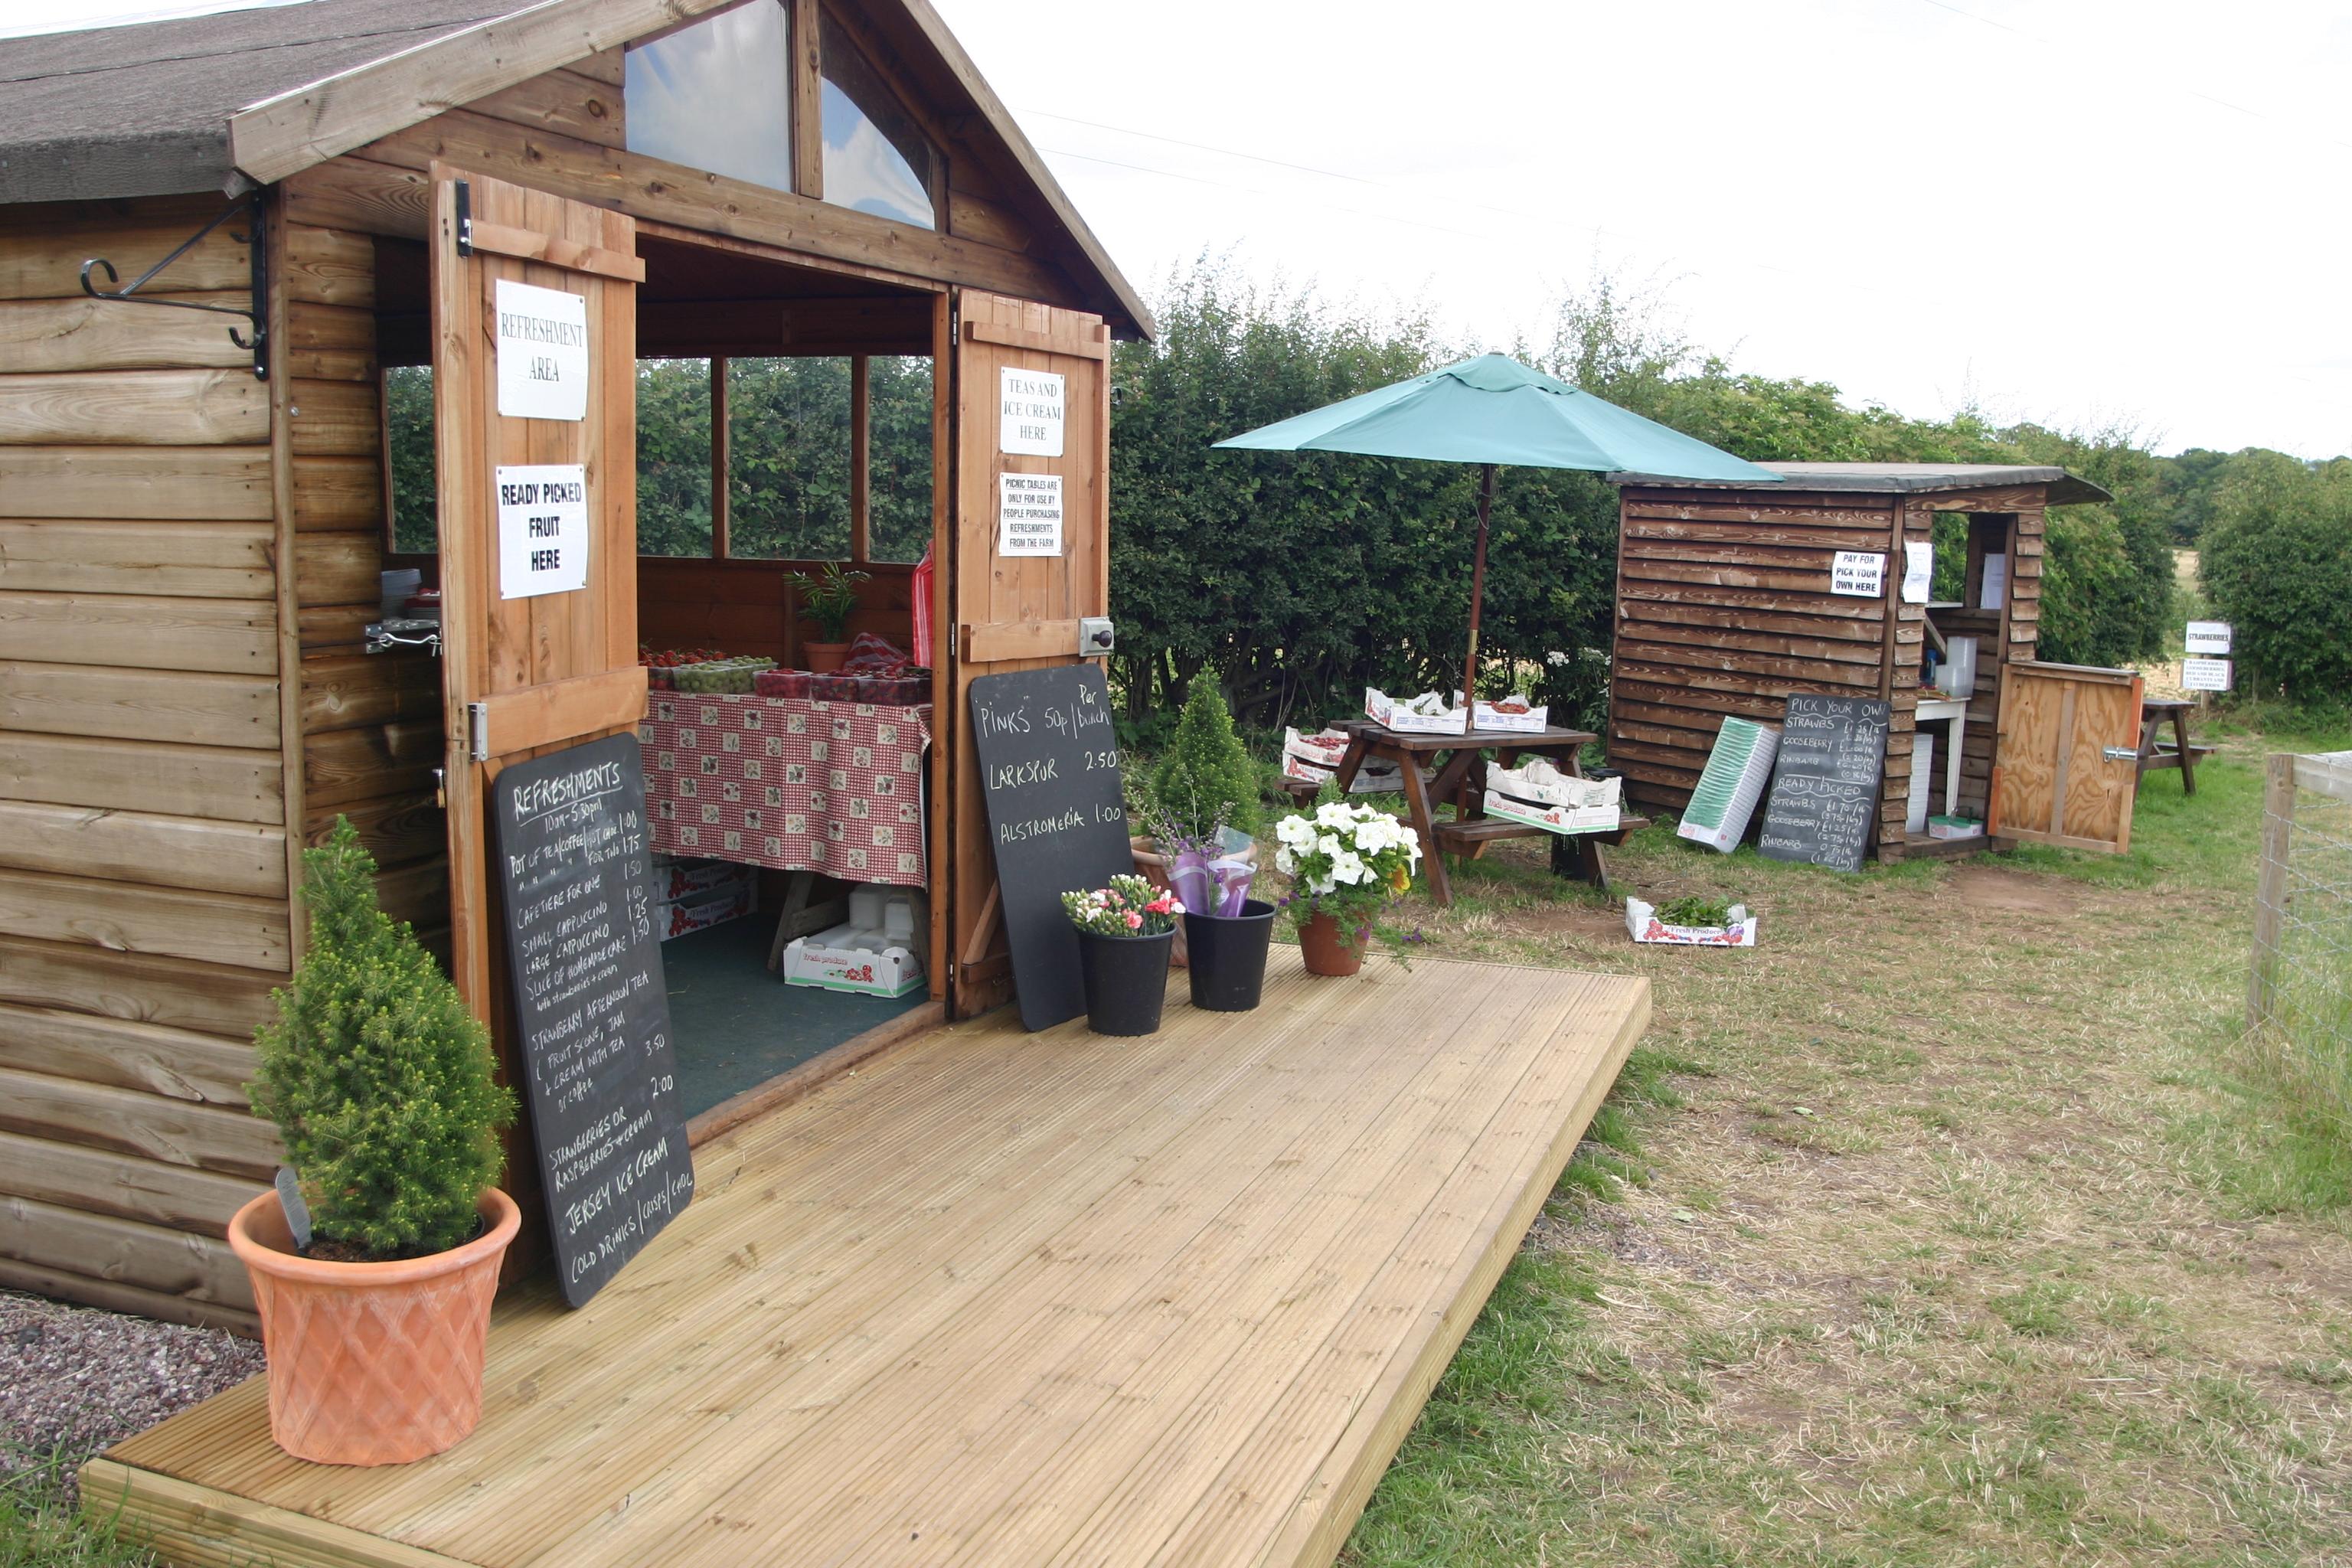 Haywood Park Farm pick your own